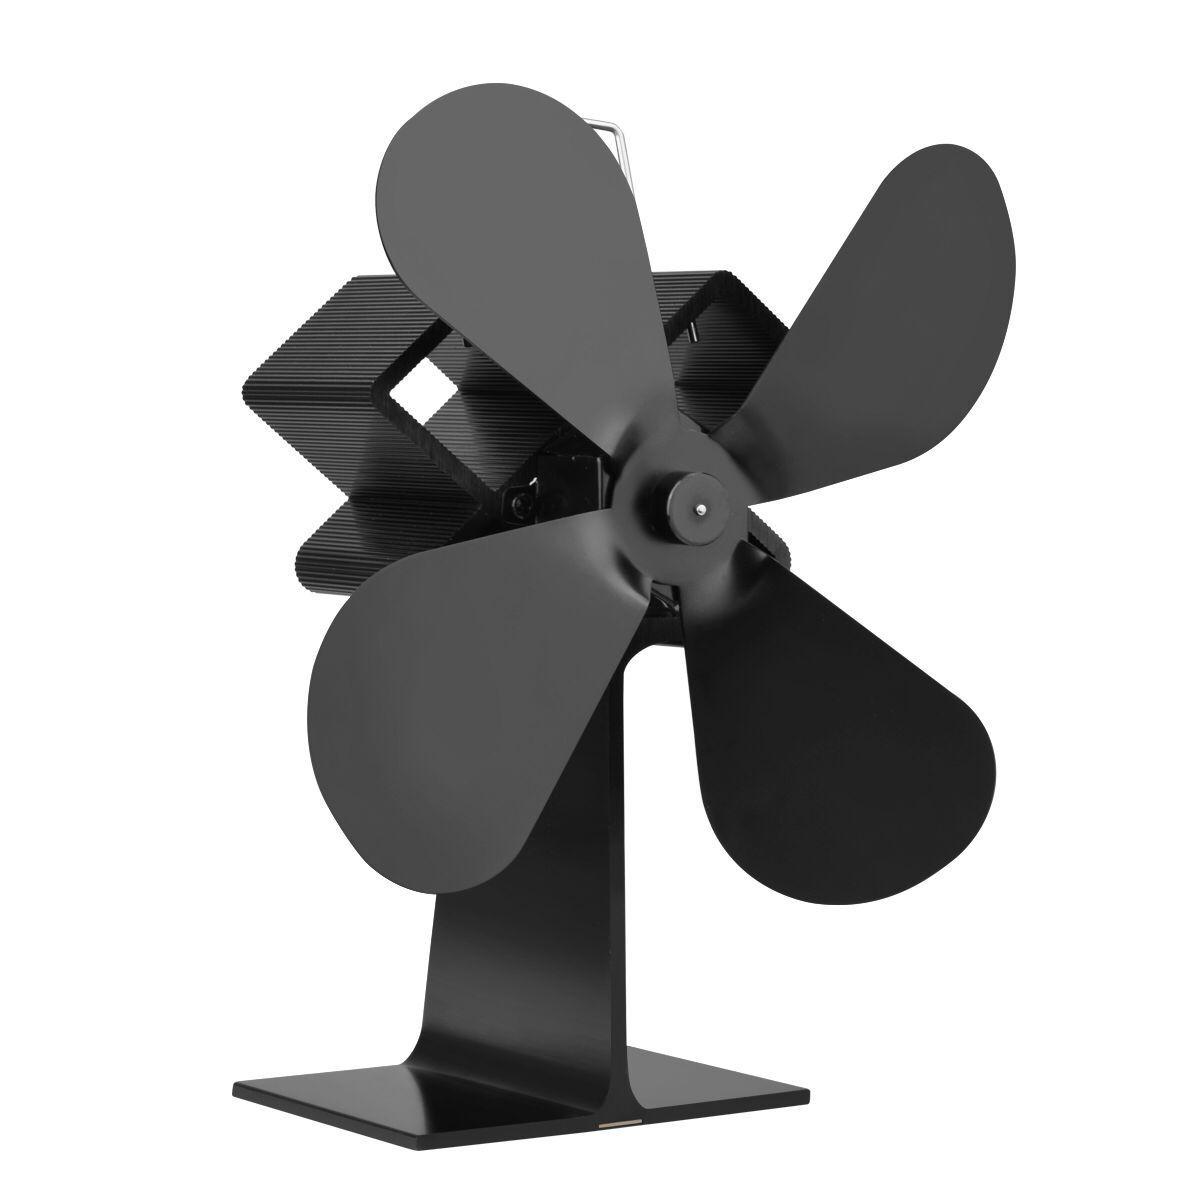 4 Blades Heat power wood stove Eco fan Home wood Burner Fireplace Blower  fuel coat saving